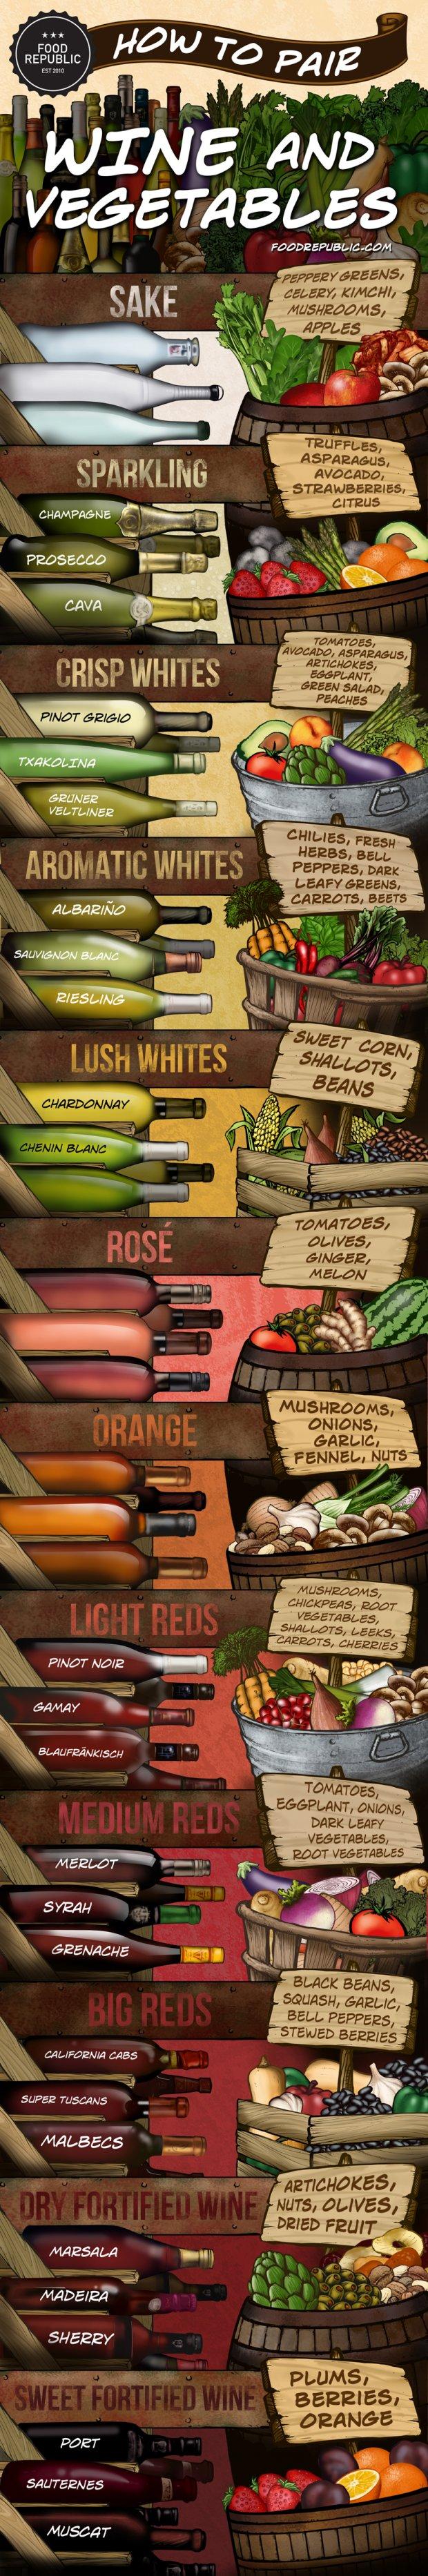 wine_veg_infographic